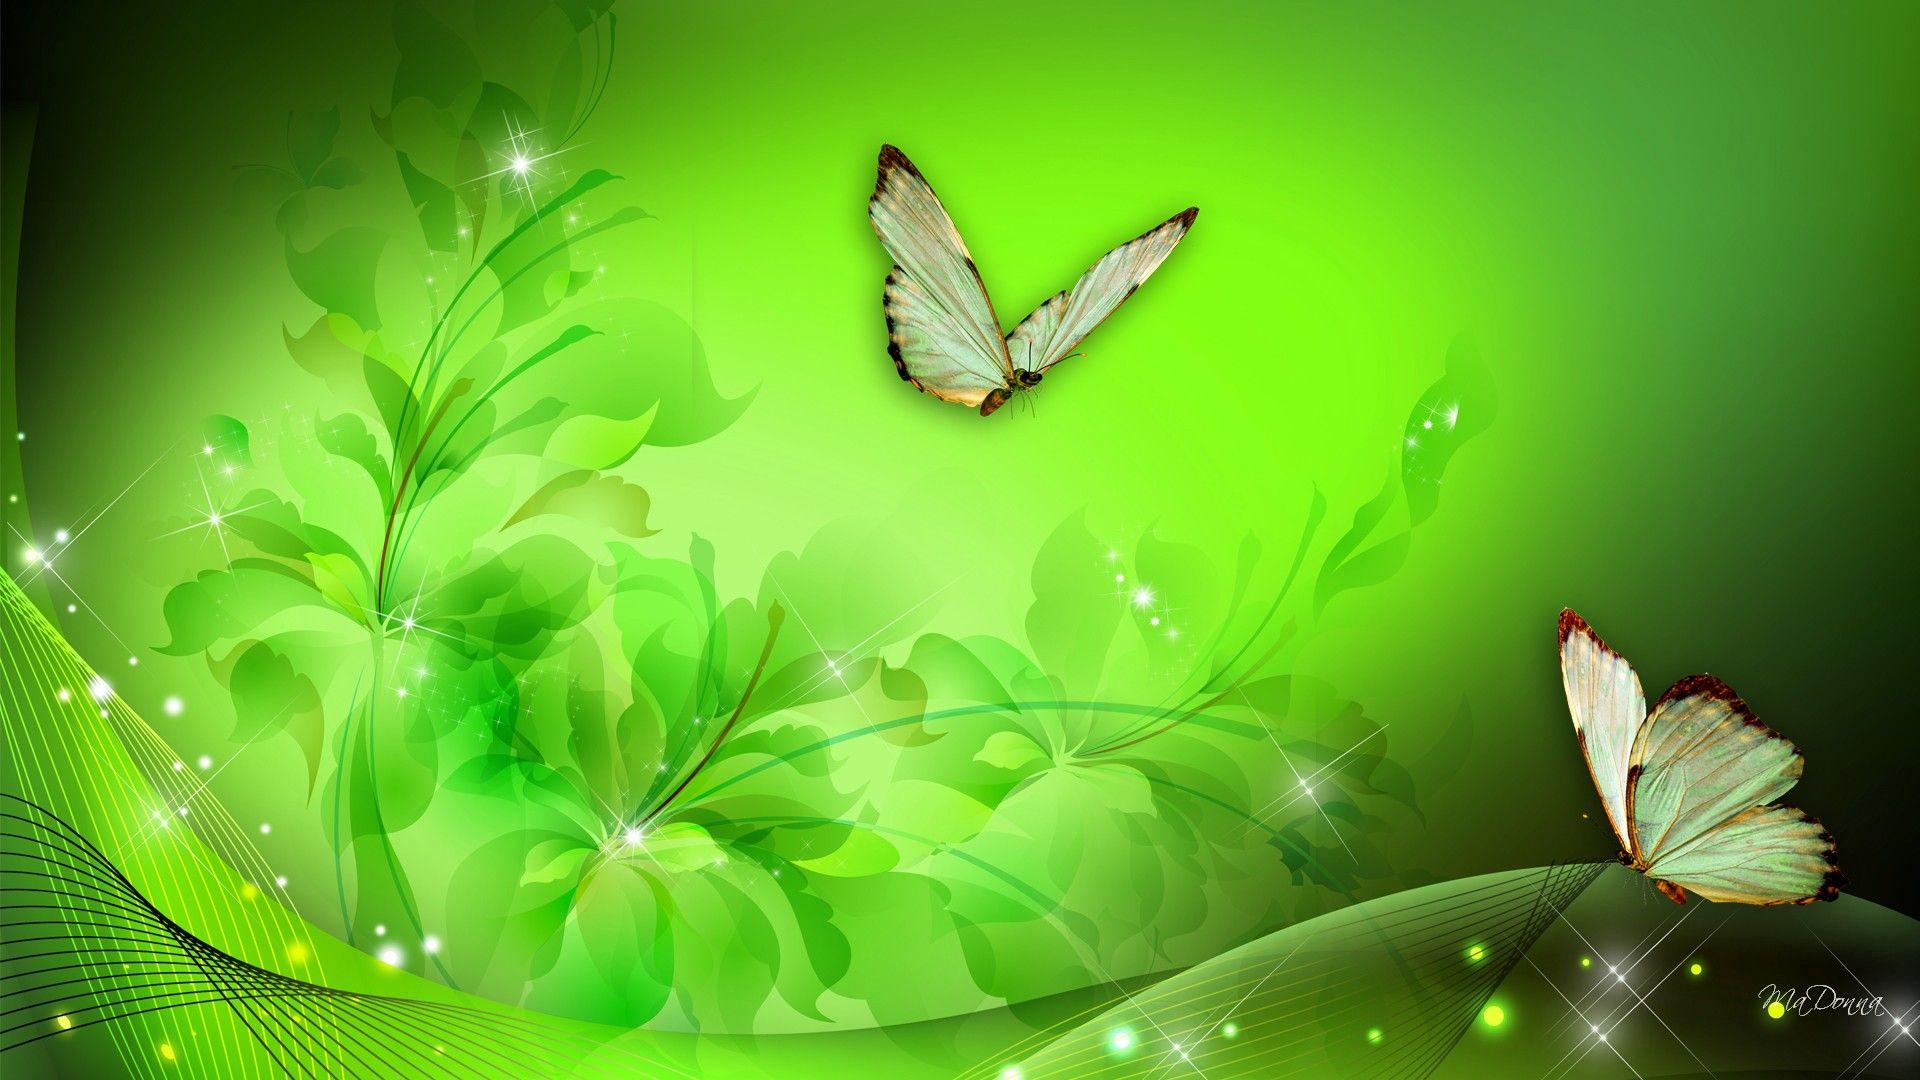 Greenfantasy art hd green floral fantasy wallpaper for Wallpaper home green